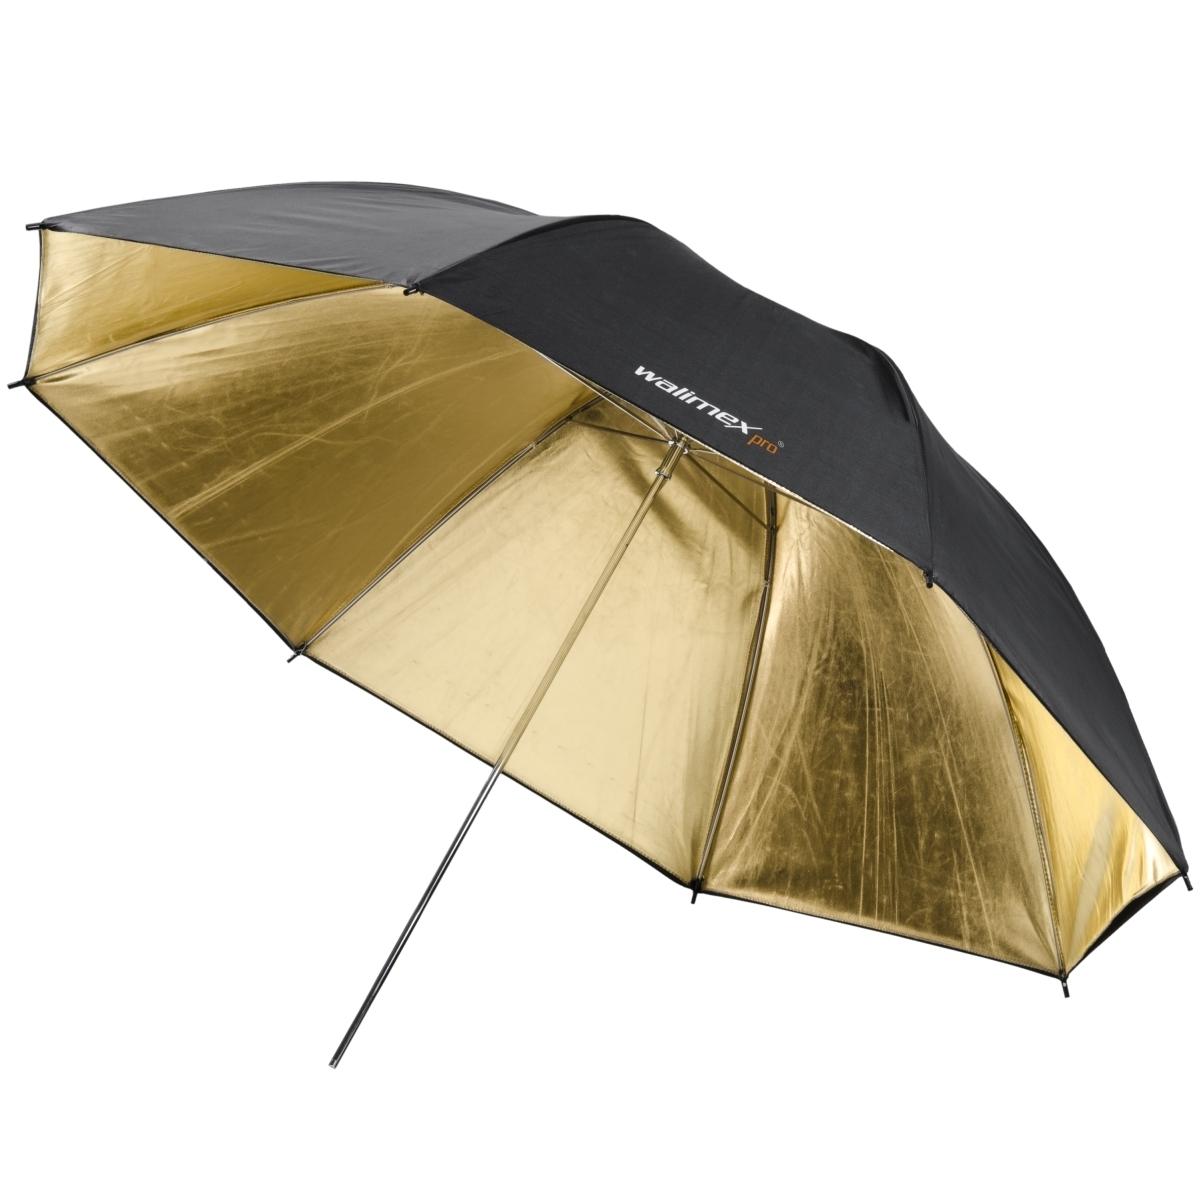 Walimex reflexschirm schwarz gold 2 lagig 109cm walimex walimex - Paraplu balances ...